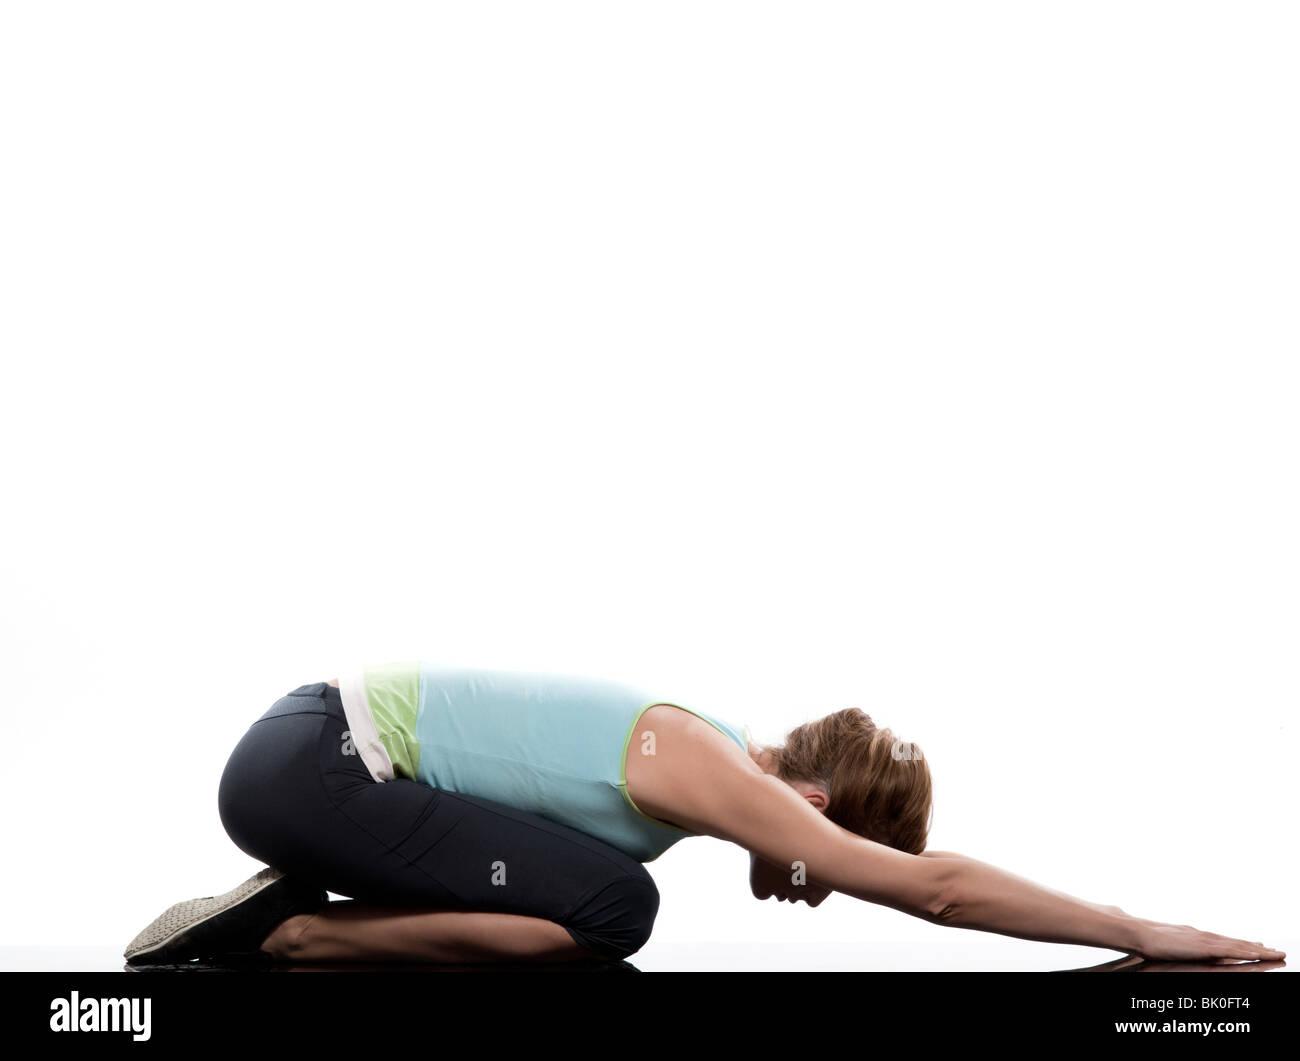 woman adho mukha virasana child pose yoga stretching workout posture on studio white background - Stock Image